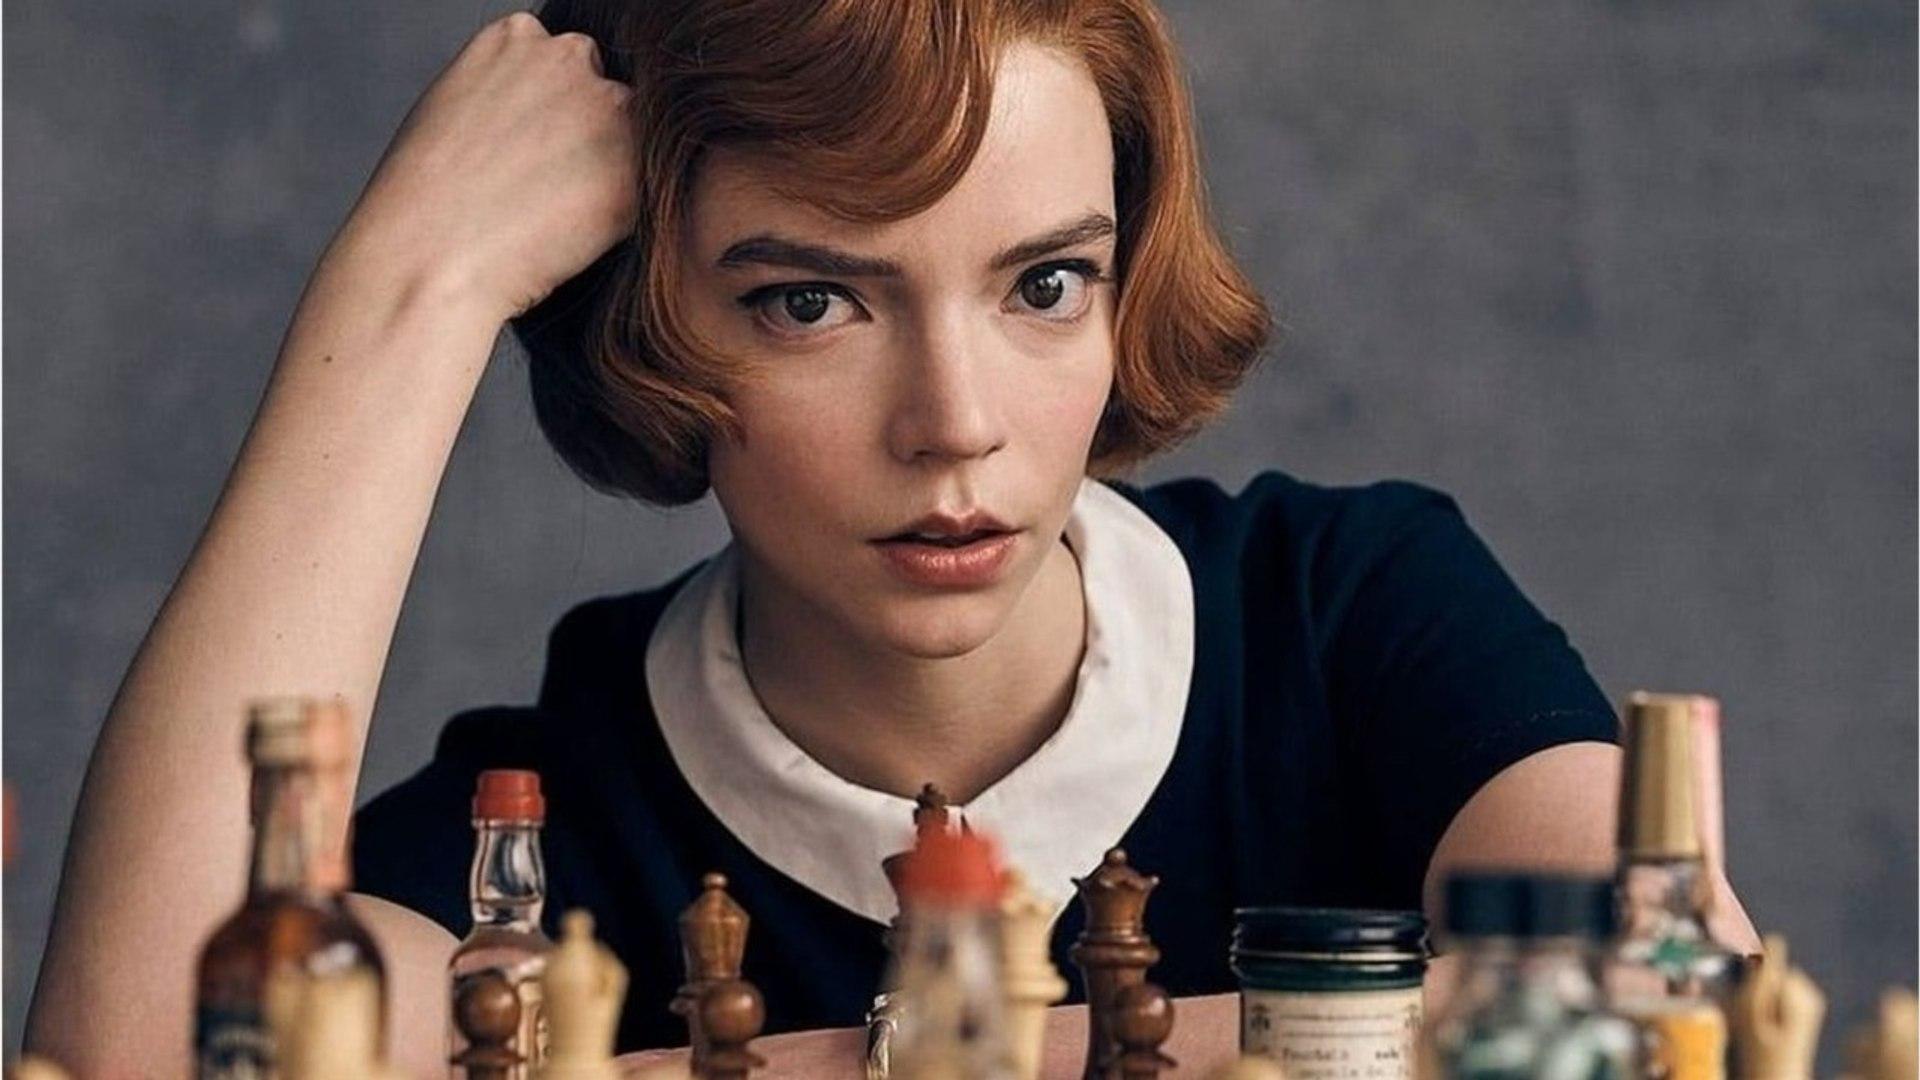 Ganador_Cuanto_sabes_sobre_ajedrez